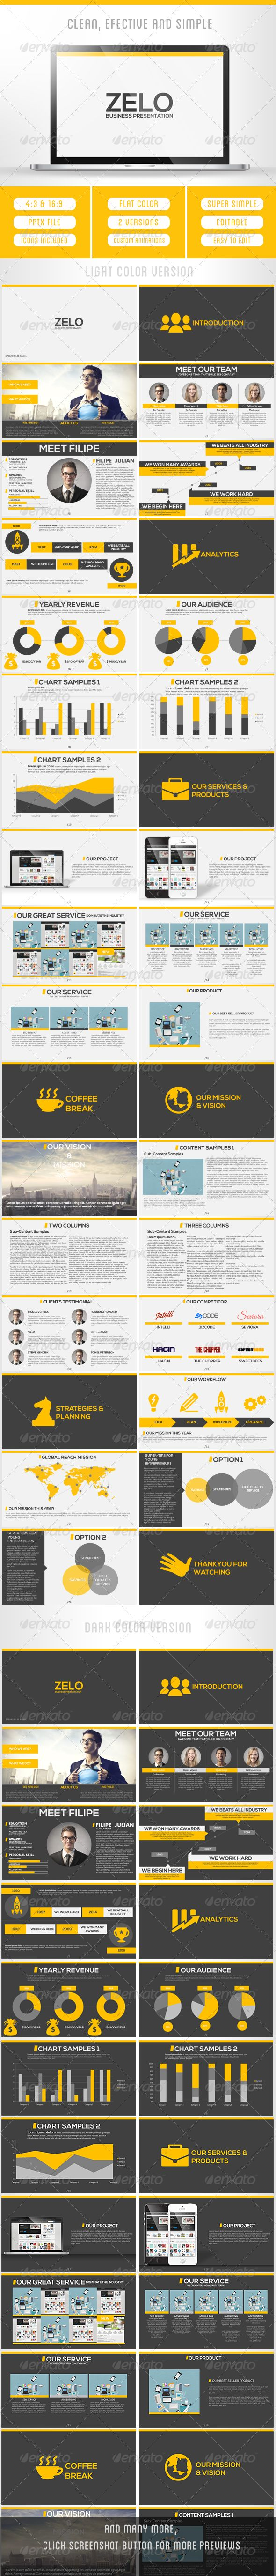 ZELO - Fresh Business Presentation - Business Powerpoint Templates